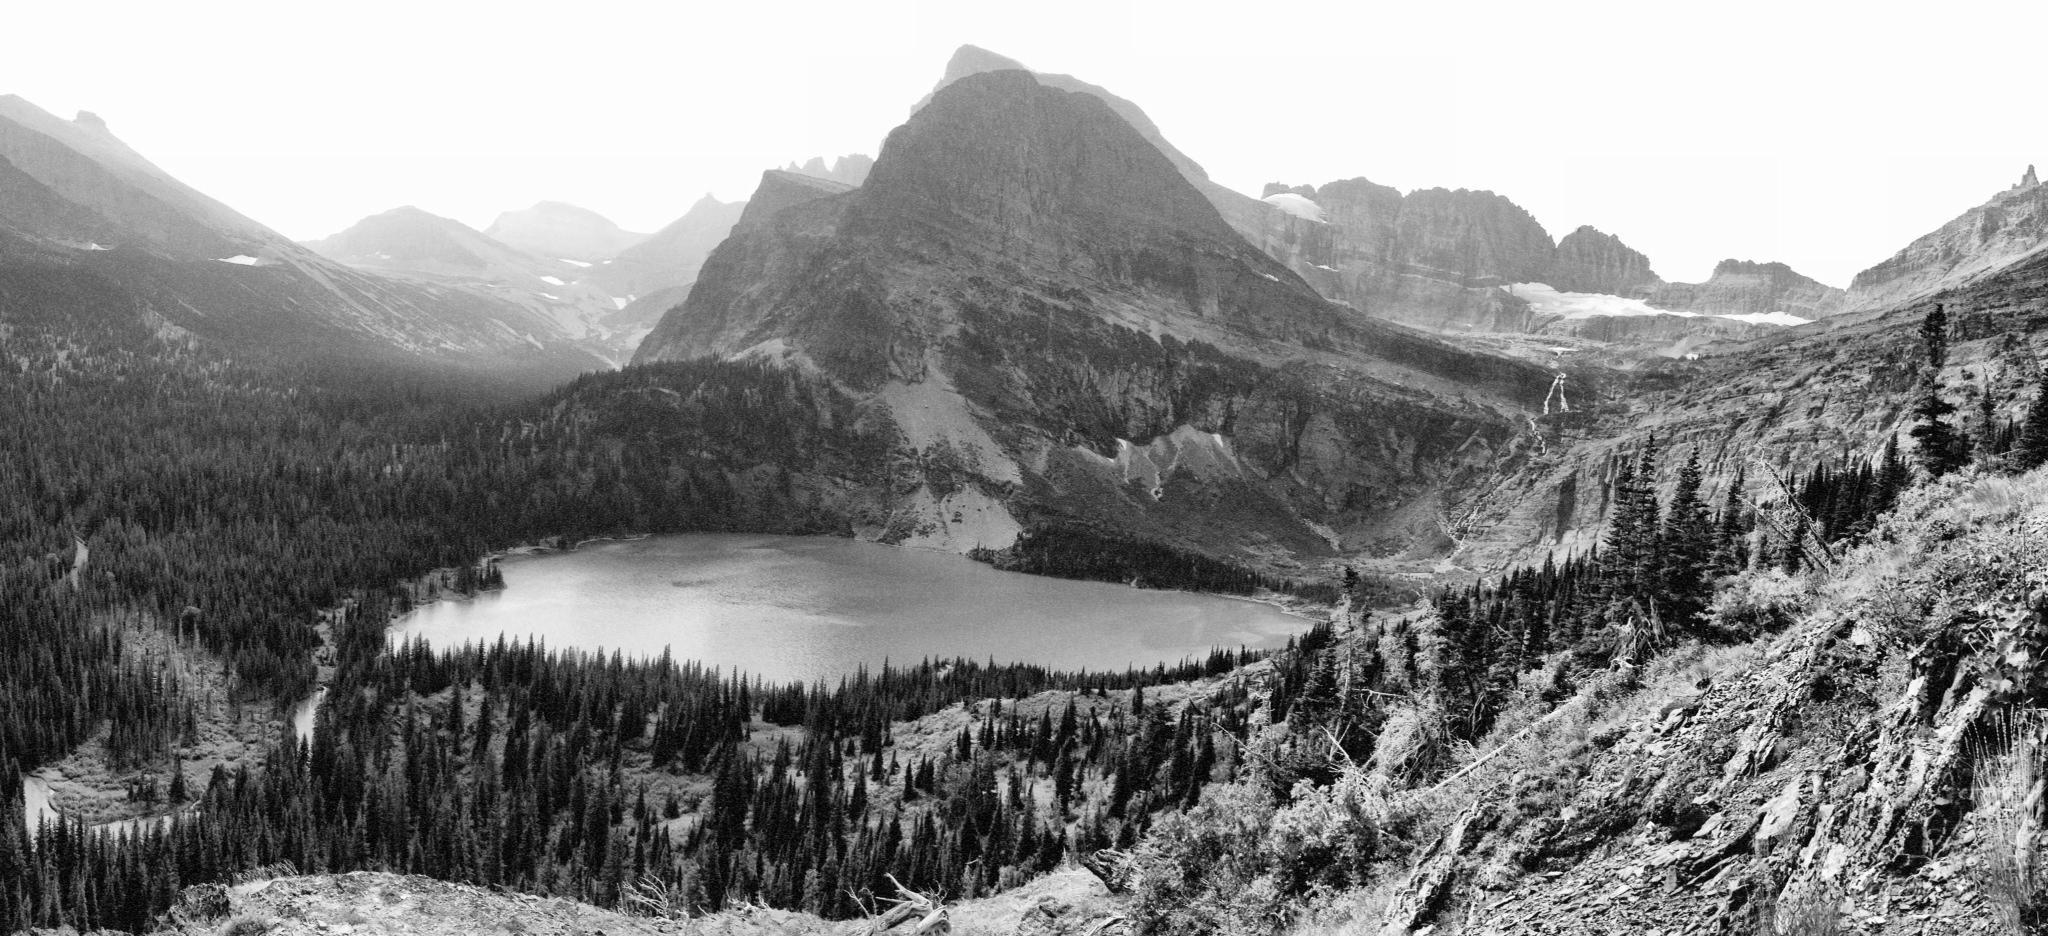 Grinnell Glacier Trail, Glacier National Park, Montana   Purchase